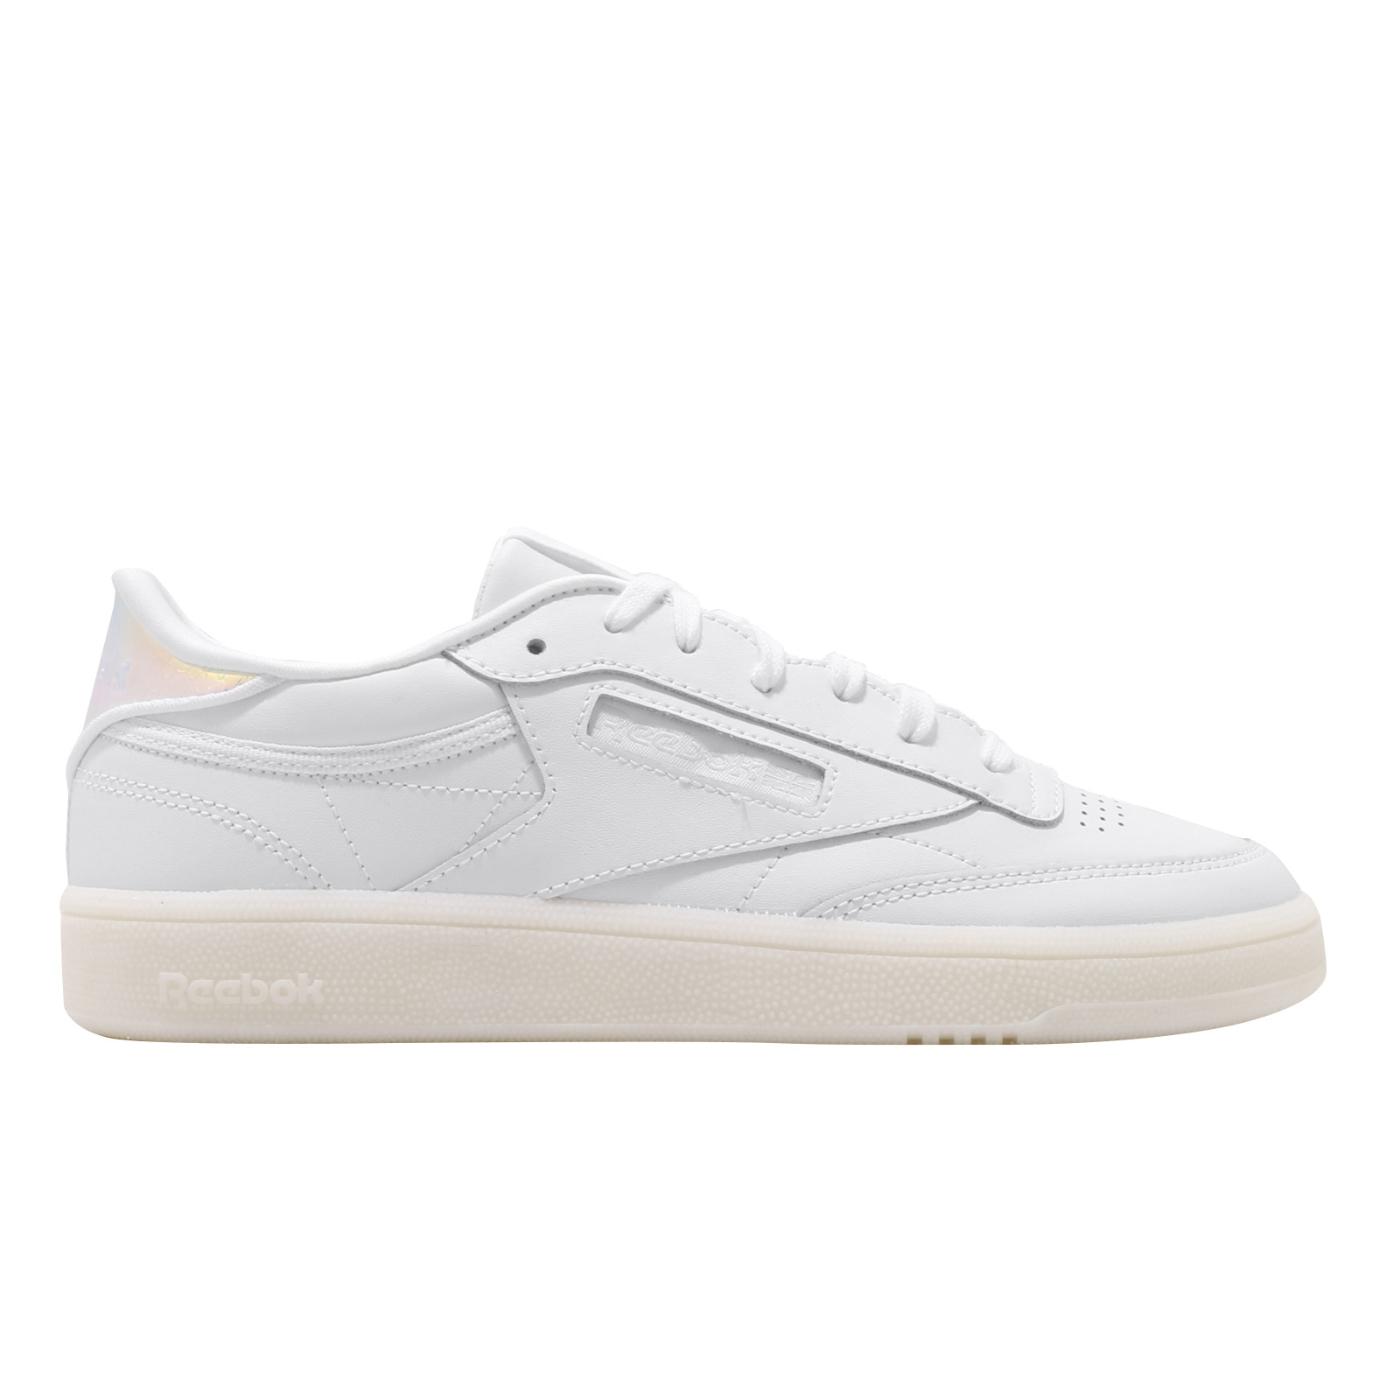 Reebok 休閒鞋 Club C 85 運動 女鞋